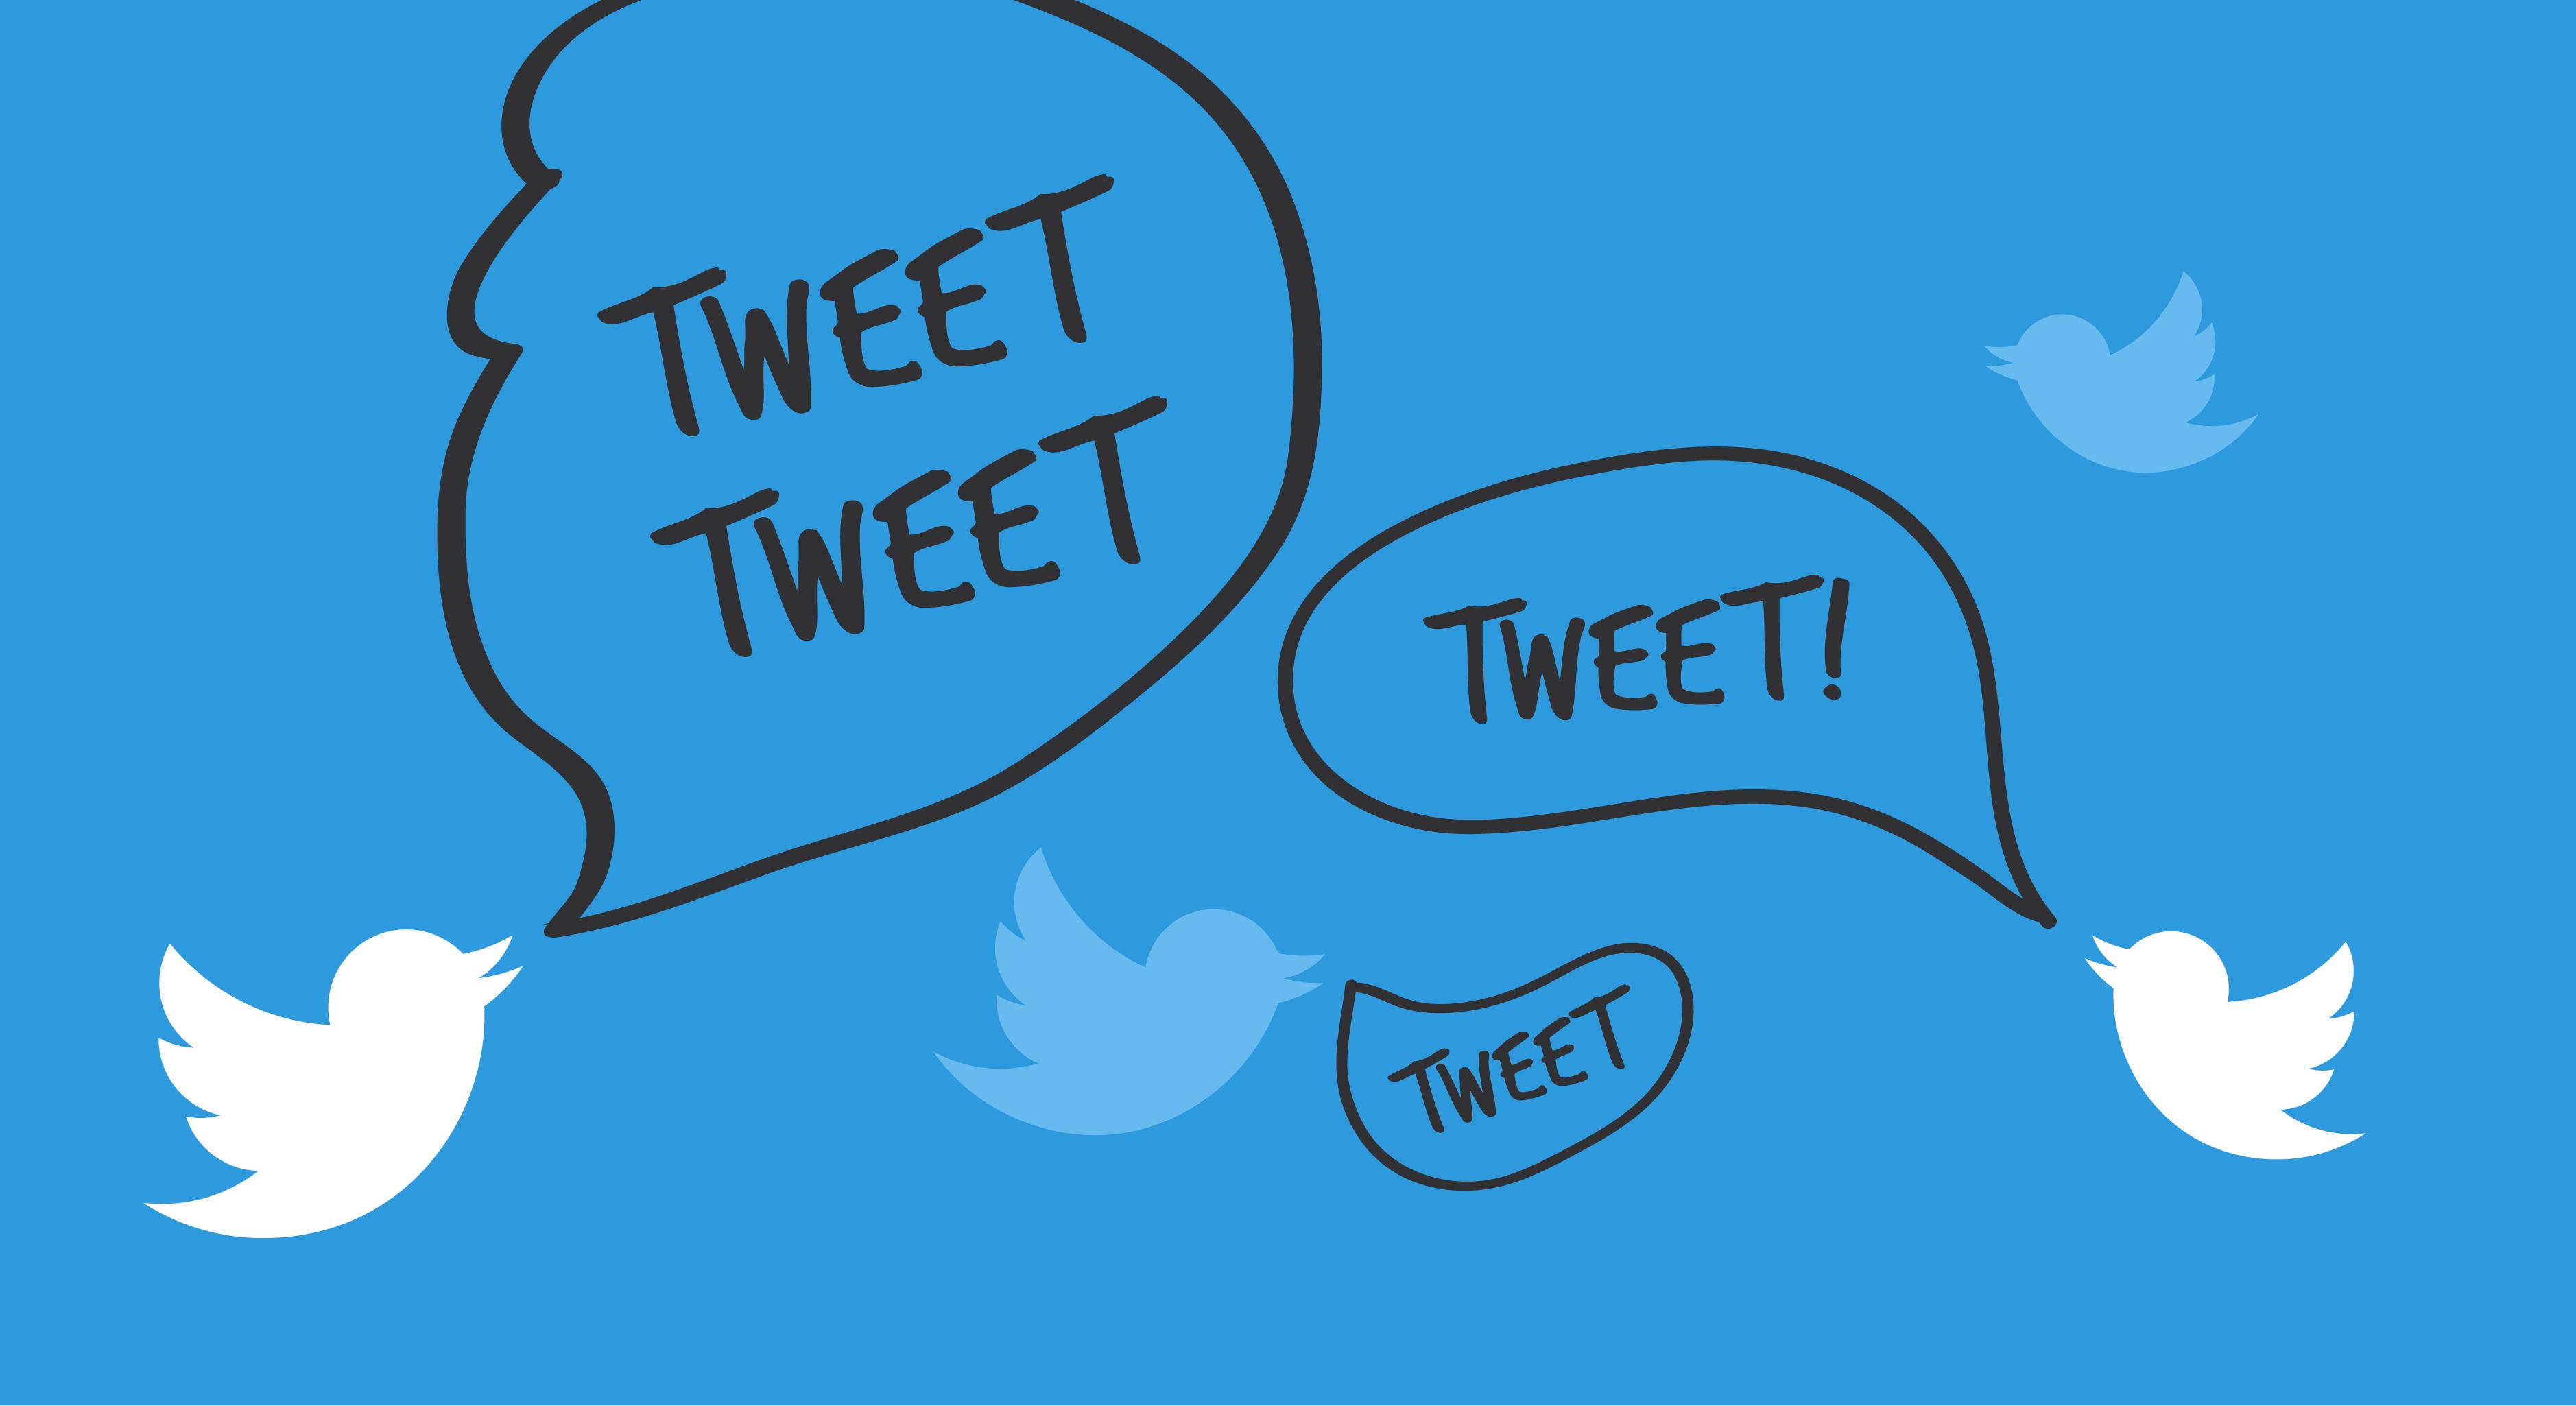 Instant 100+ HQ Twitter Tweets